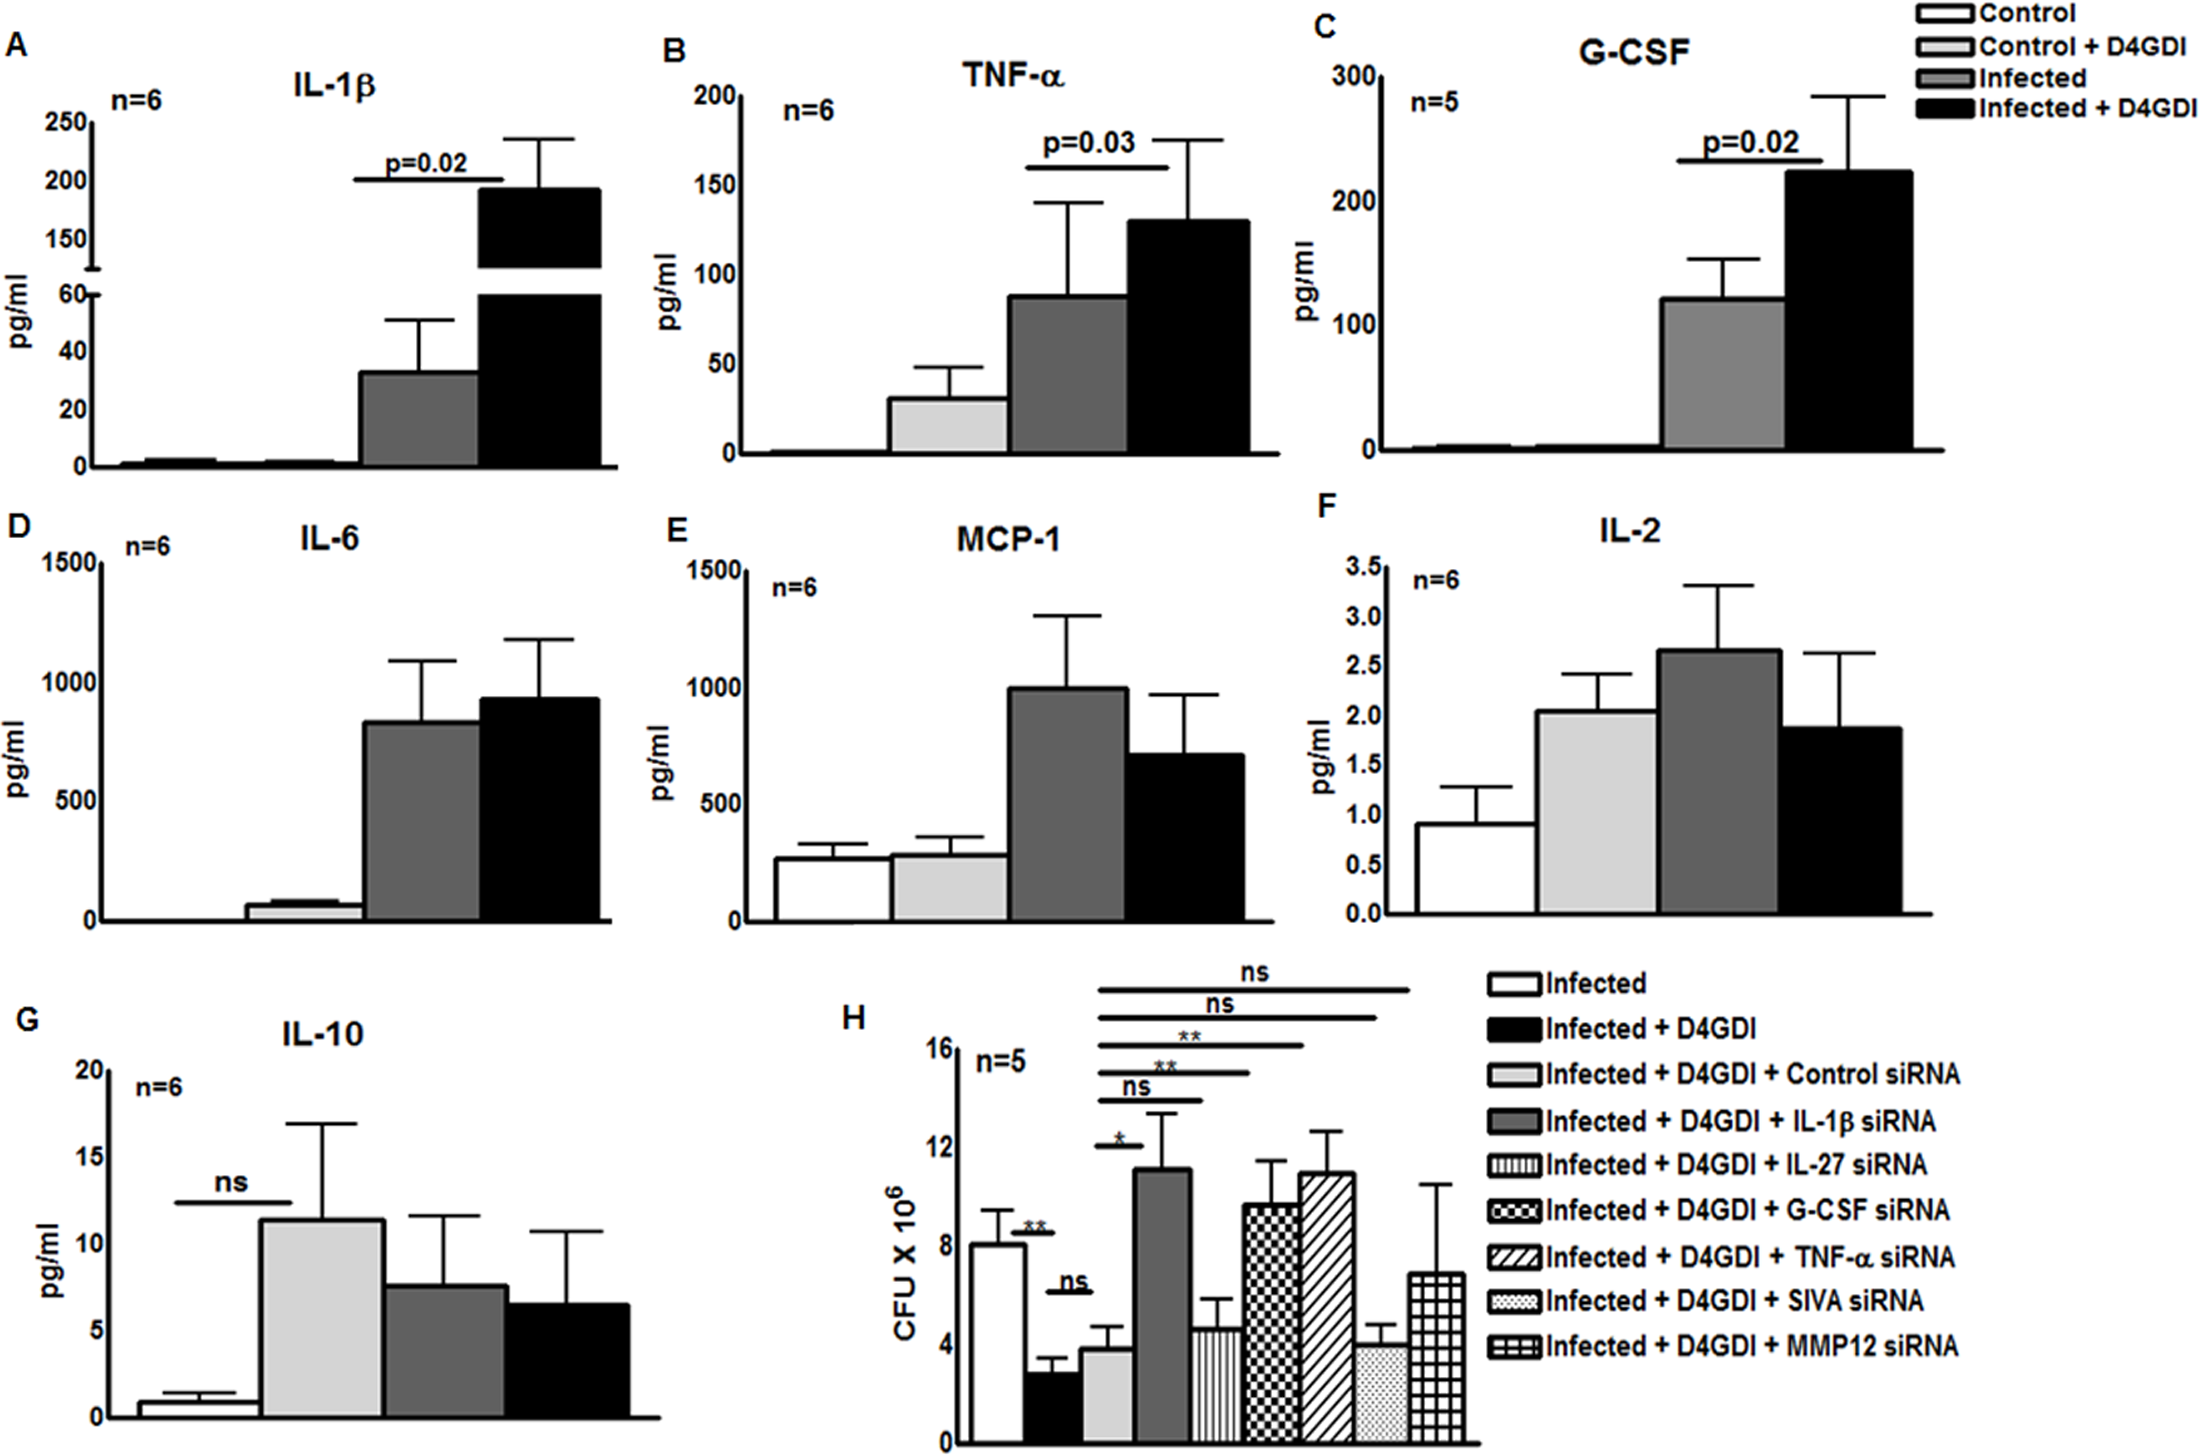 IL-1β and TNF-α contribute to D4GDI-dependent inhibition of <i>M. tb</i> growth.